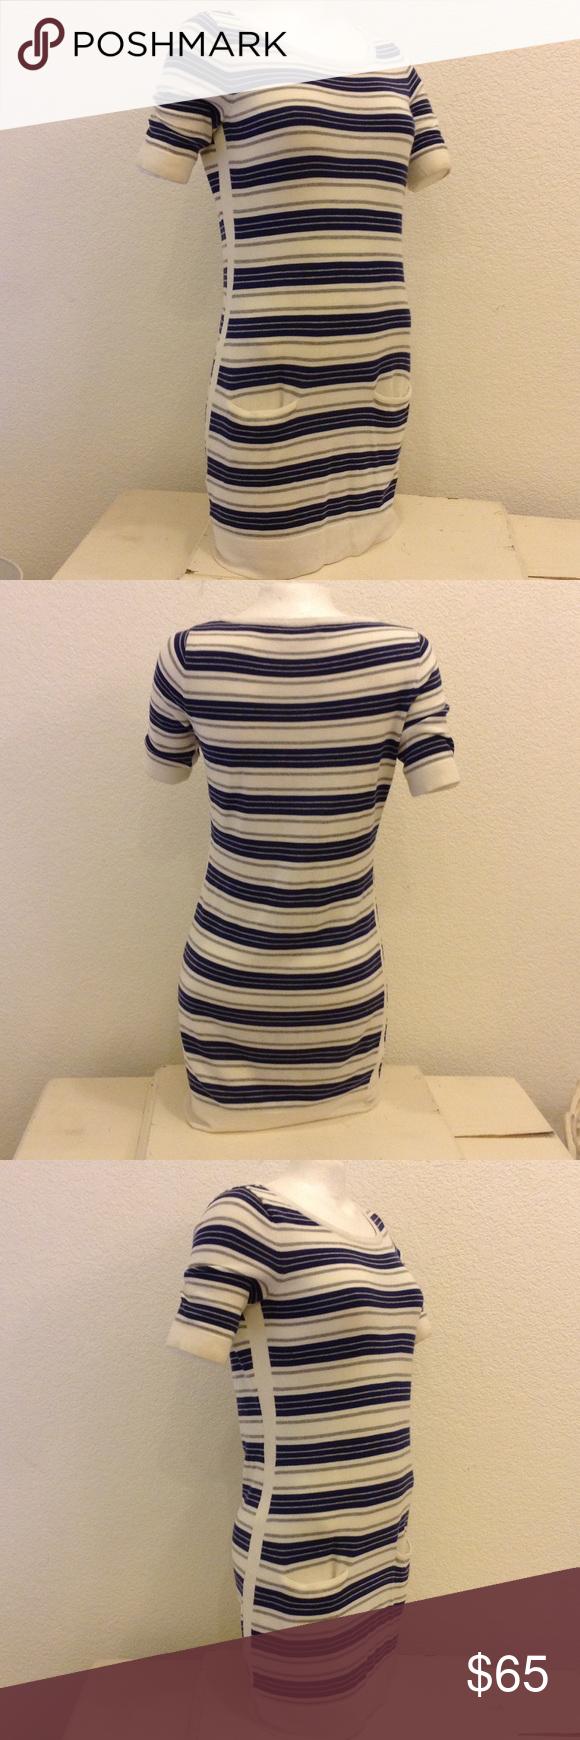 "Rag & Bone Striped Knit Dress Navy, gray and Ivory striped dress, short sleeves, front pockets, side stripe panel, 34"" long. rag & bone Dresses"